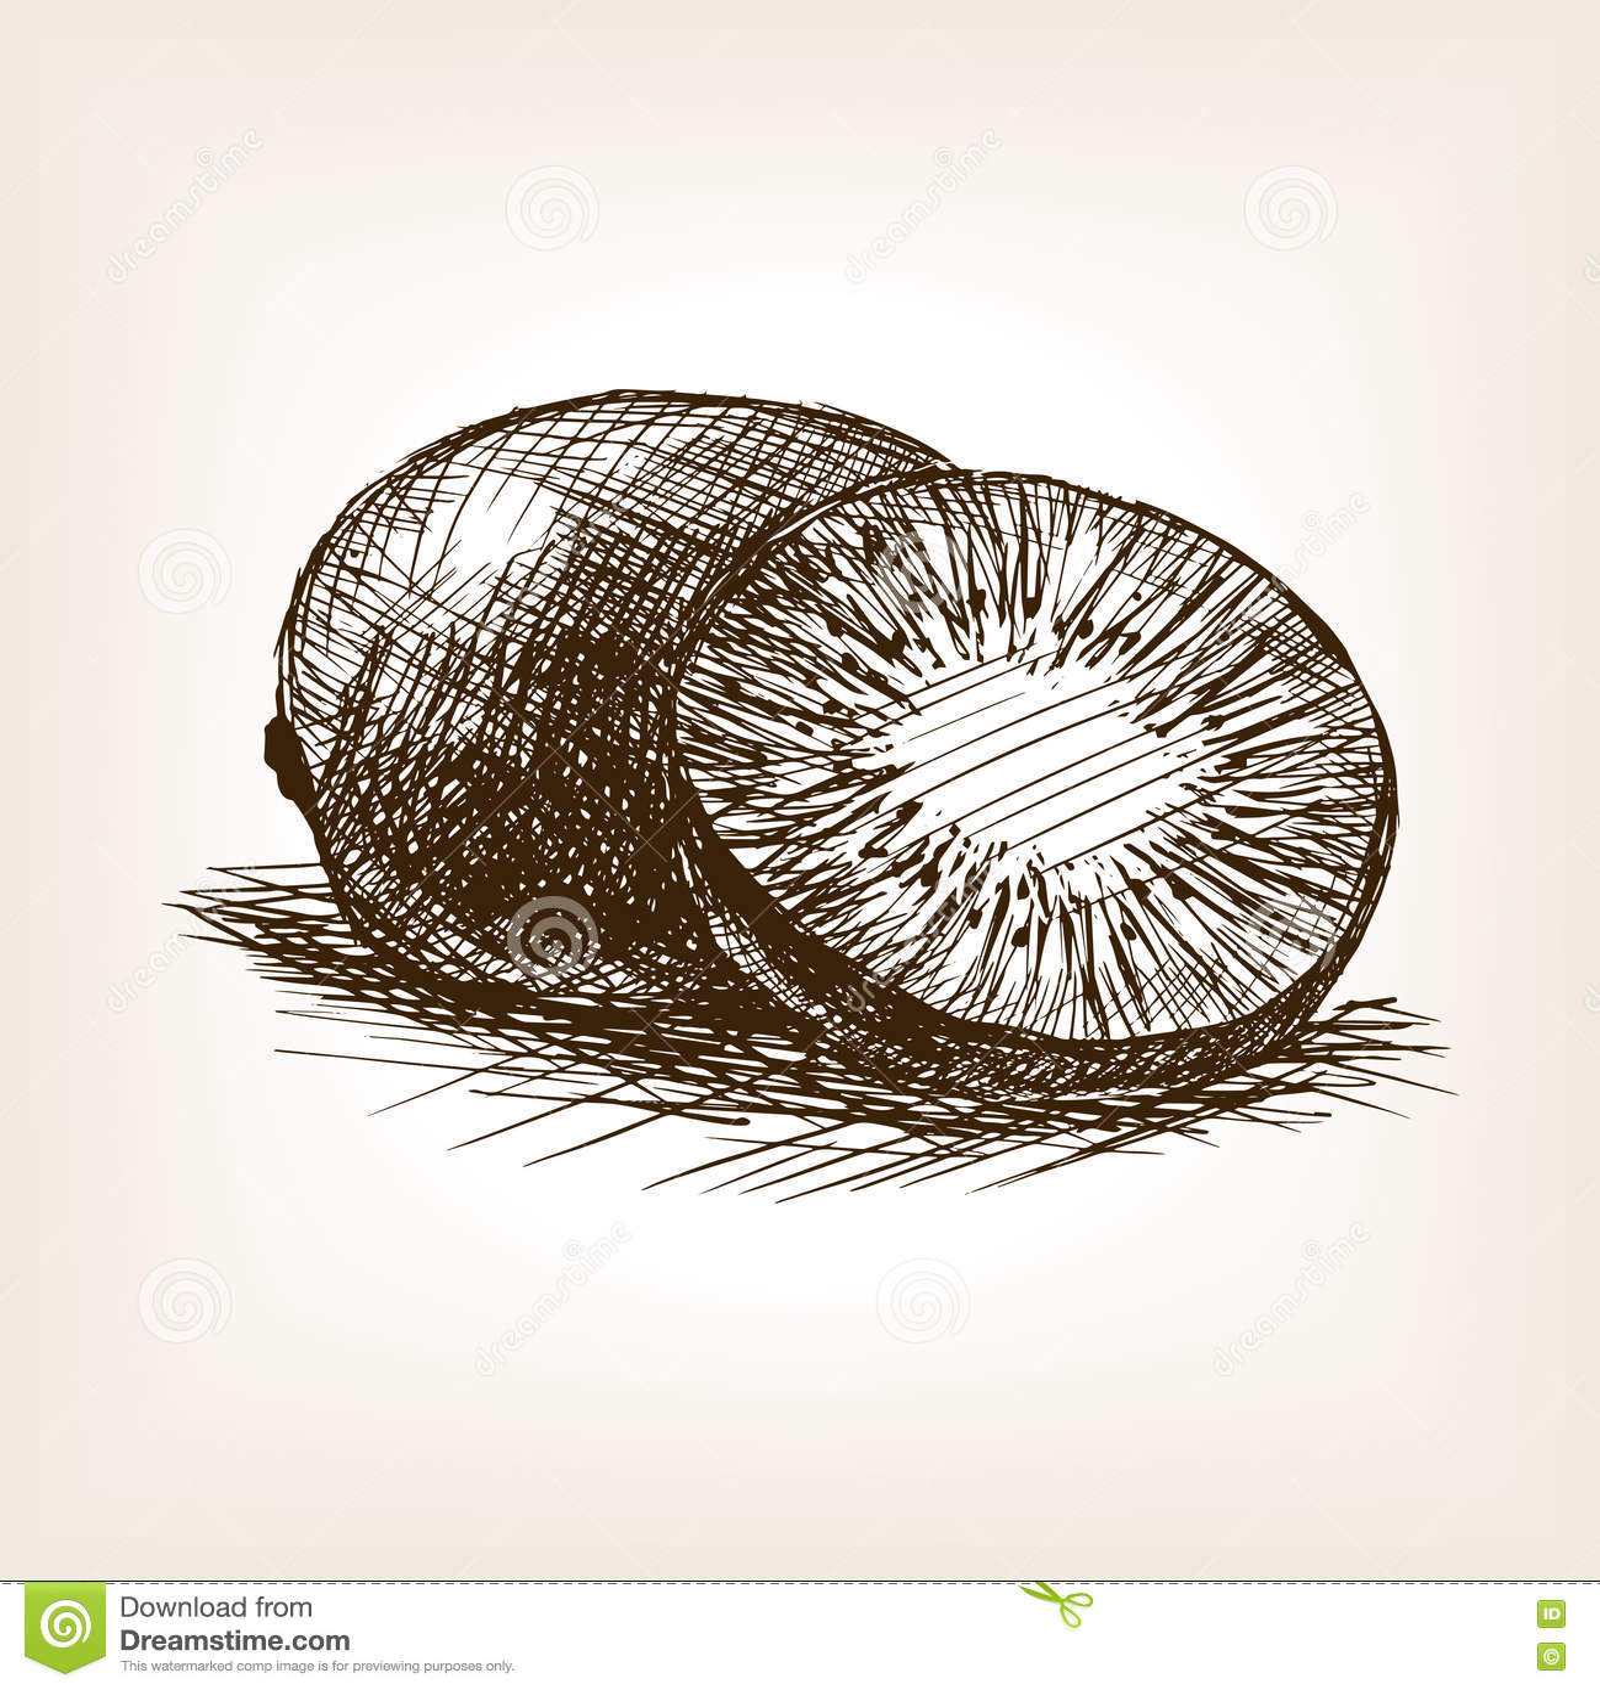 Line Drawing Kiwi : Kiwi fruit hand drawn sketch style vector stock